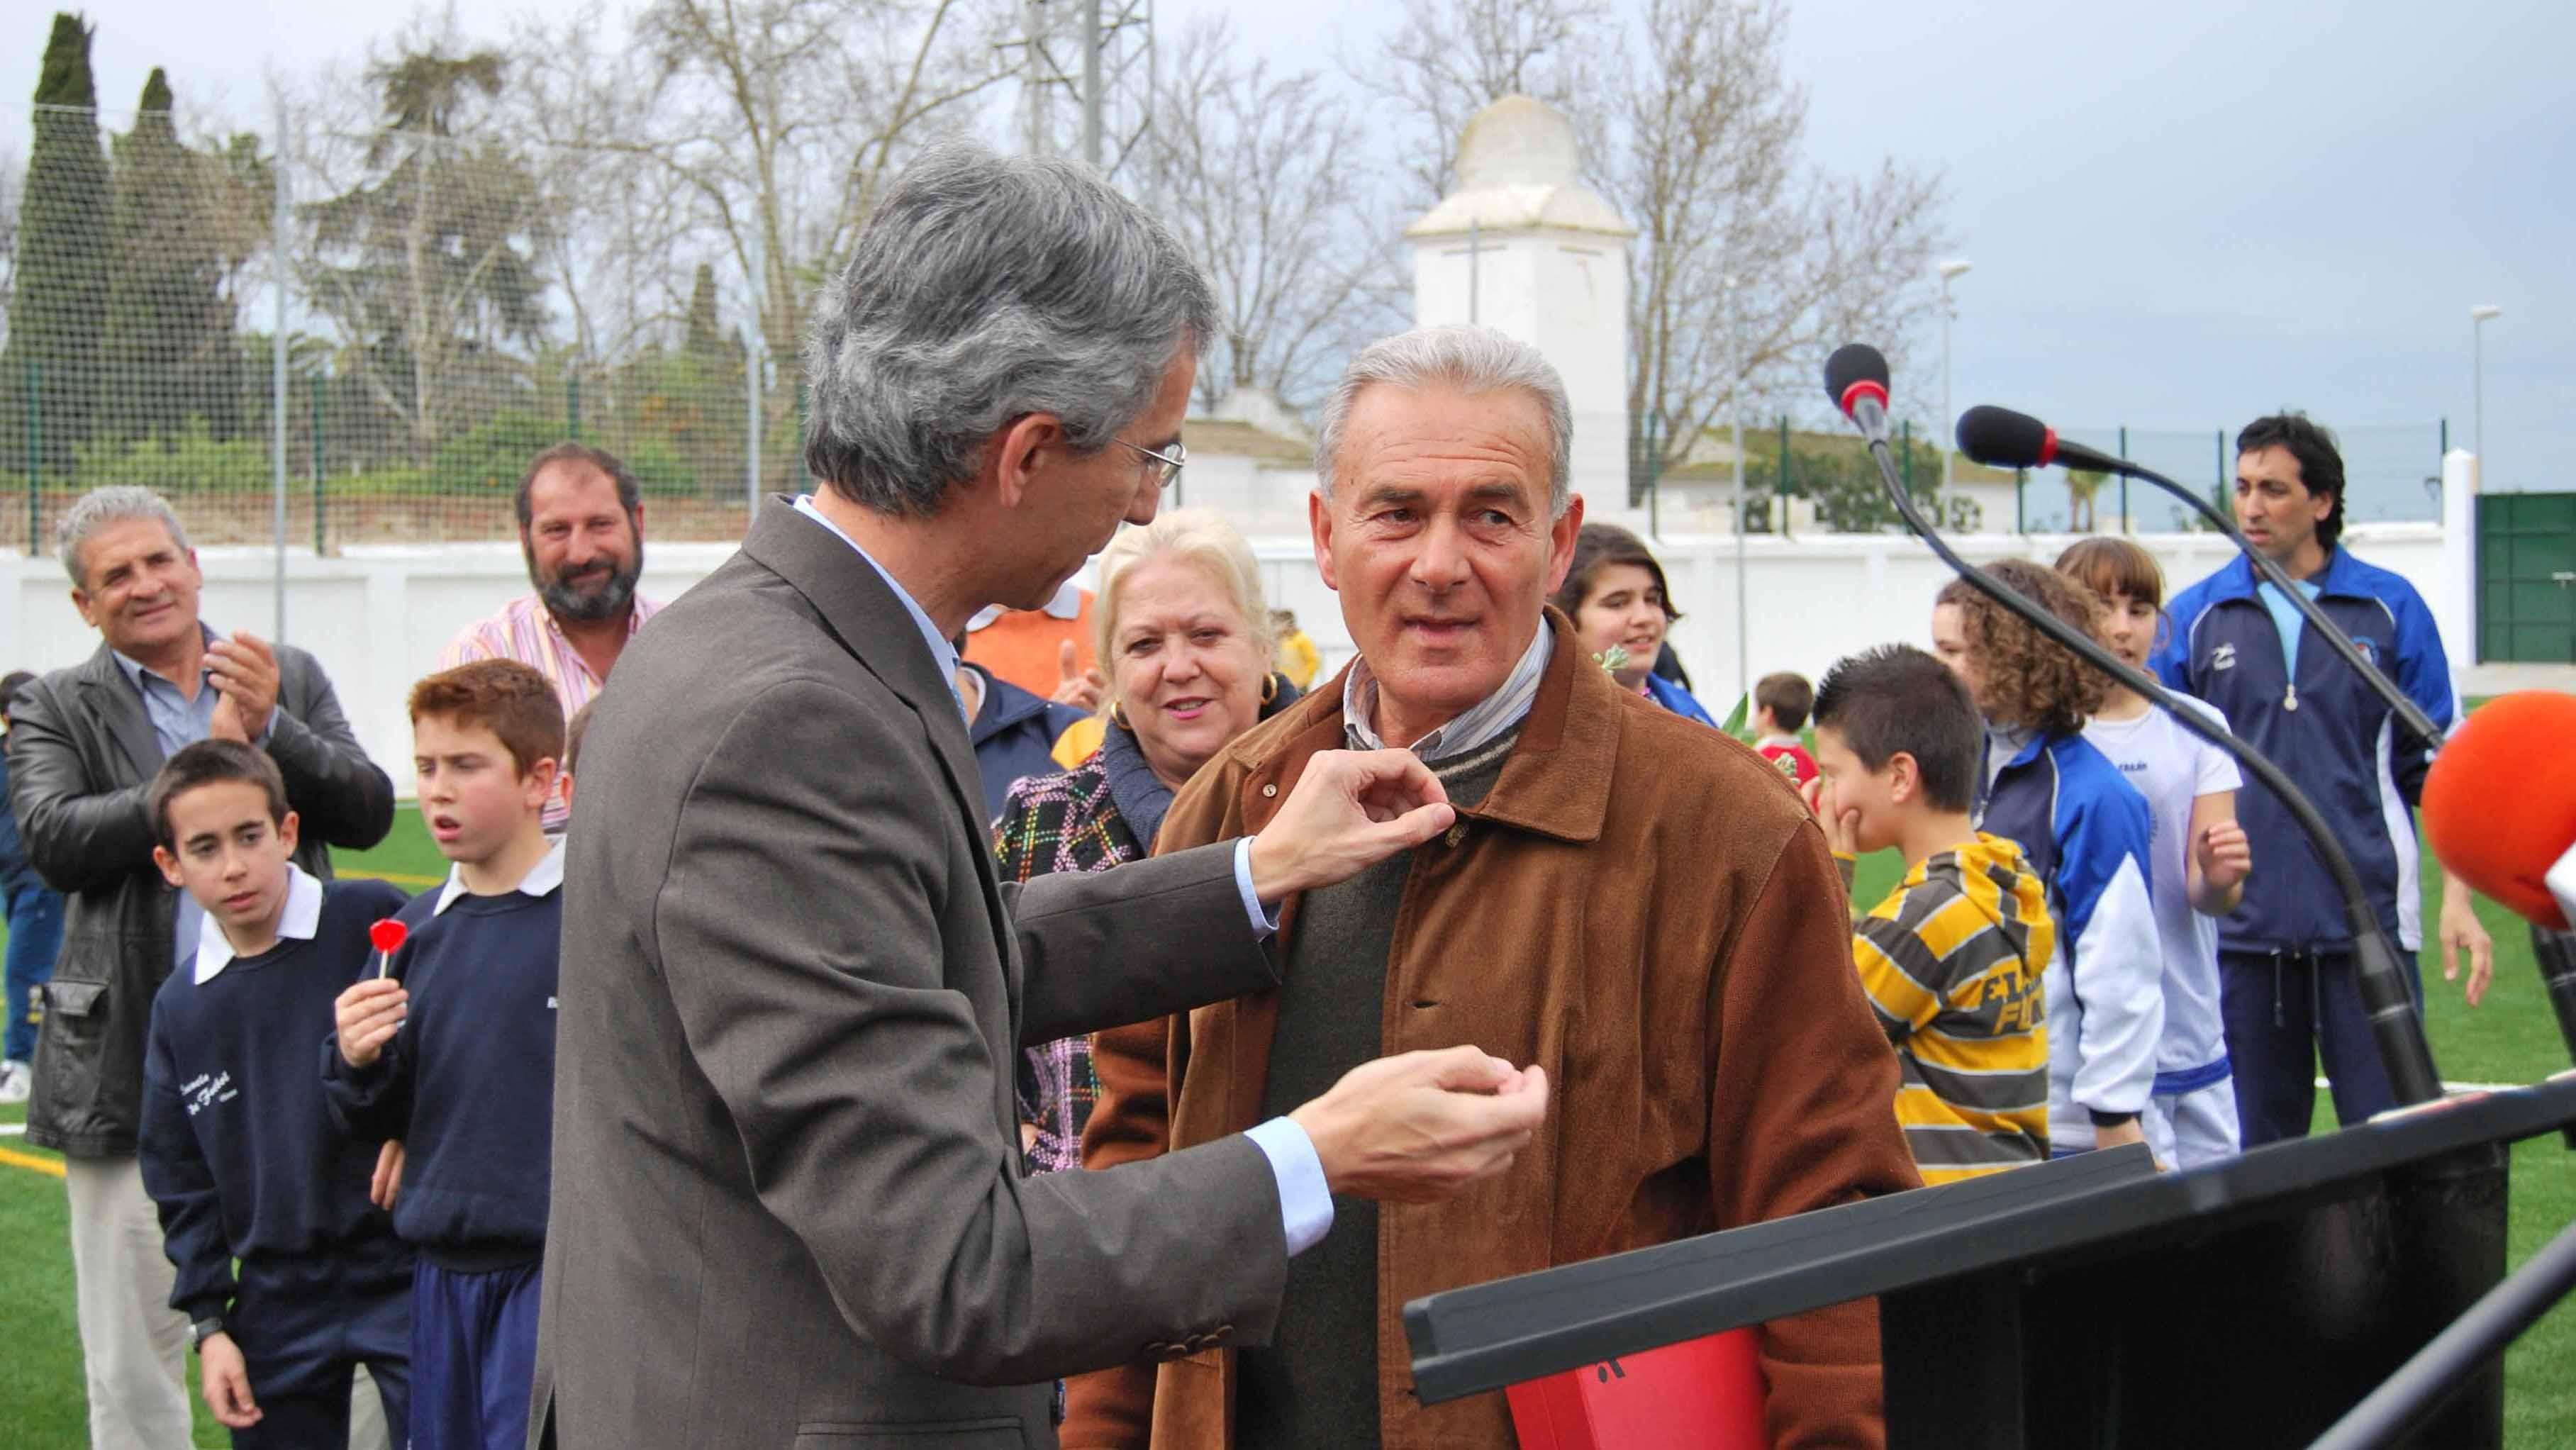 La carrera rinde homenaje al cronista deportivo Pepe Álvarez